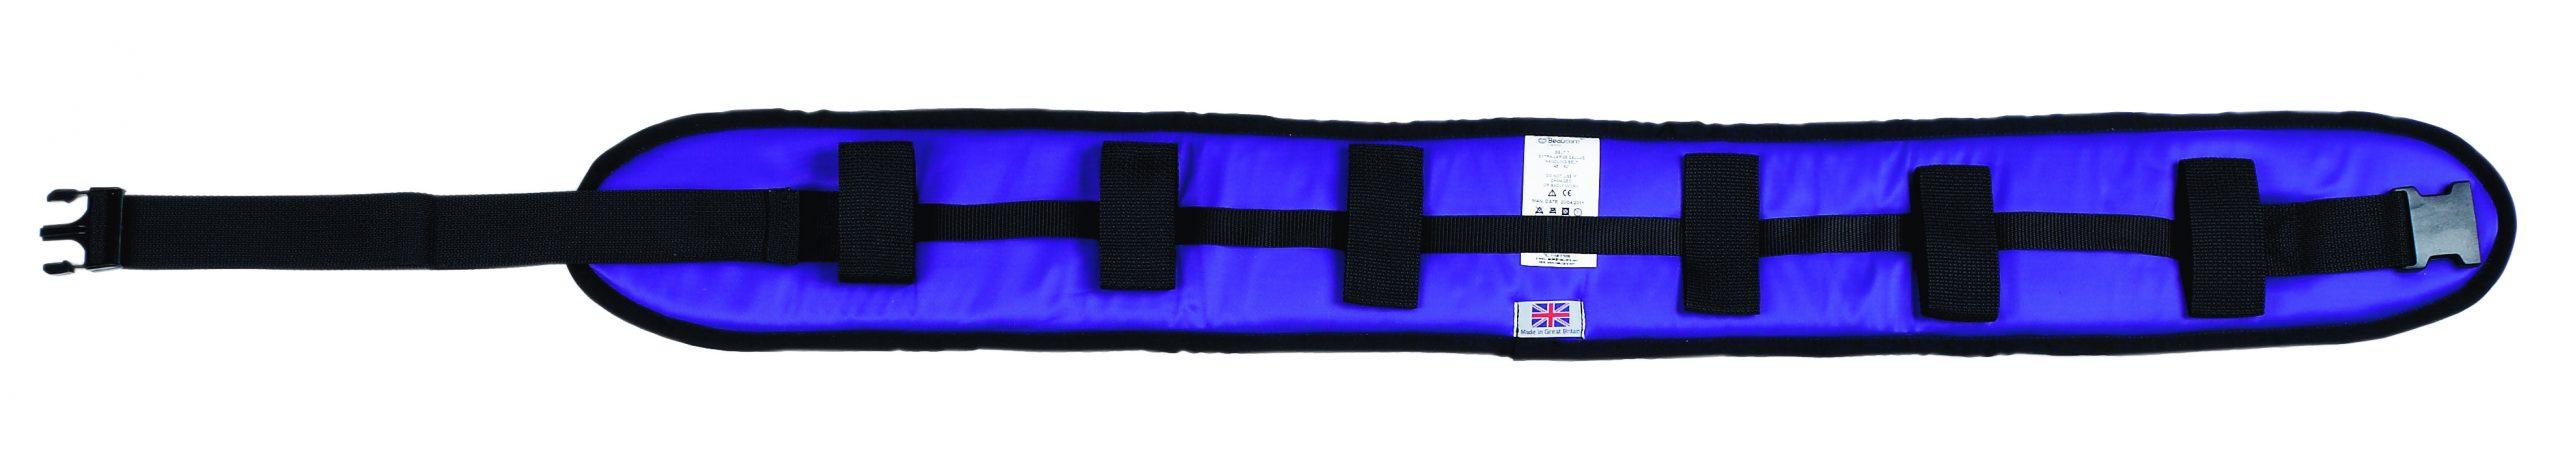 Extra Large Deluxe Handling Belt